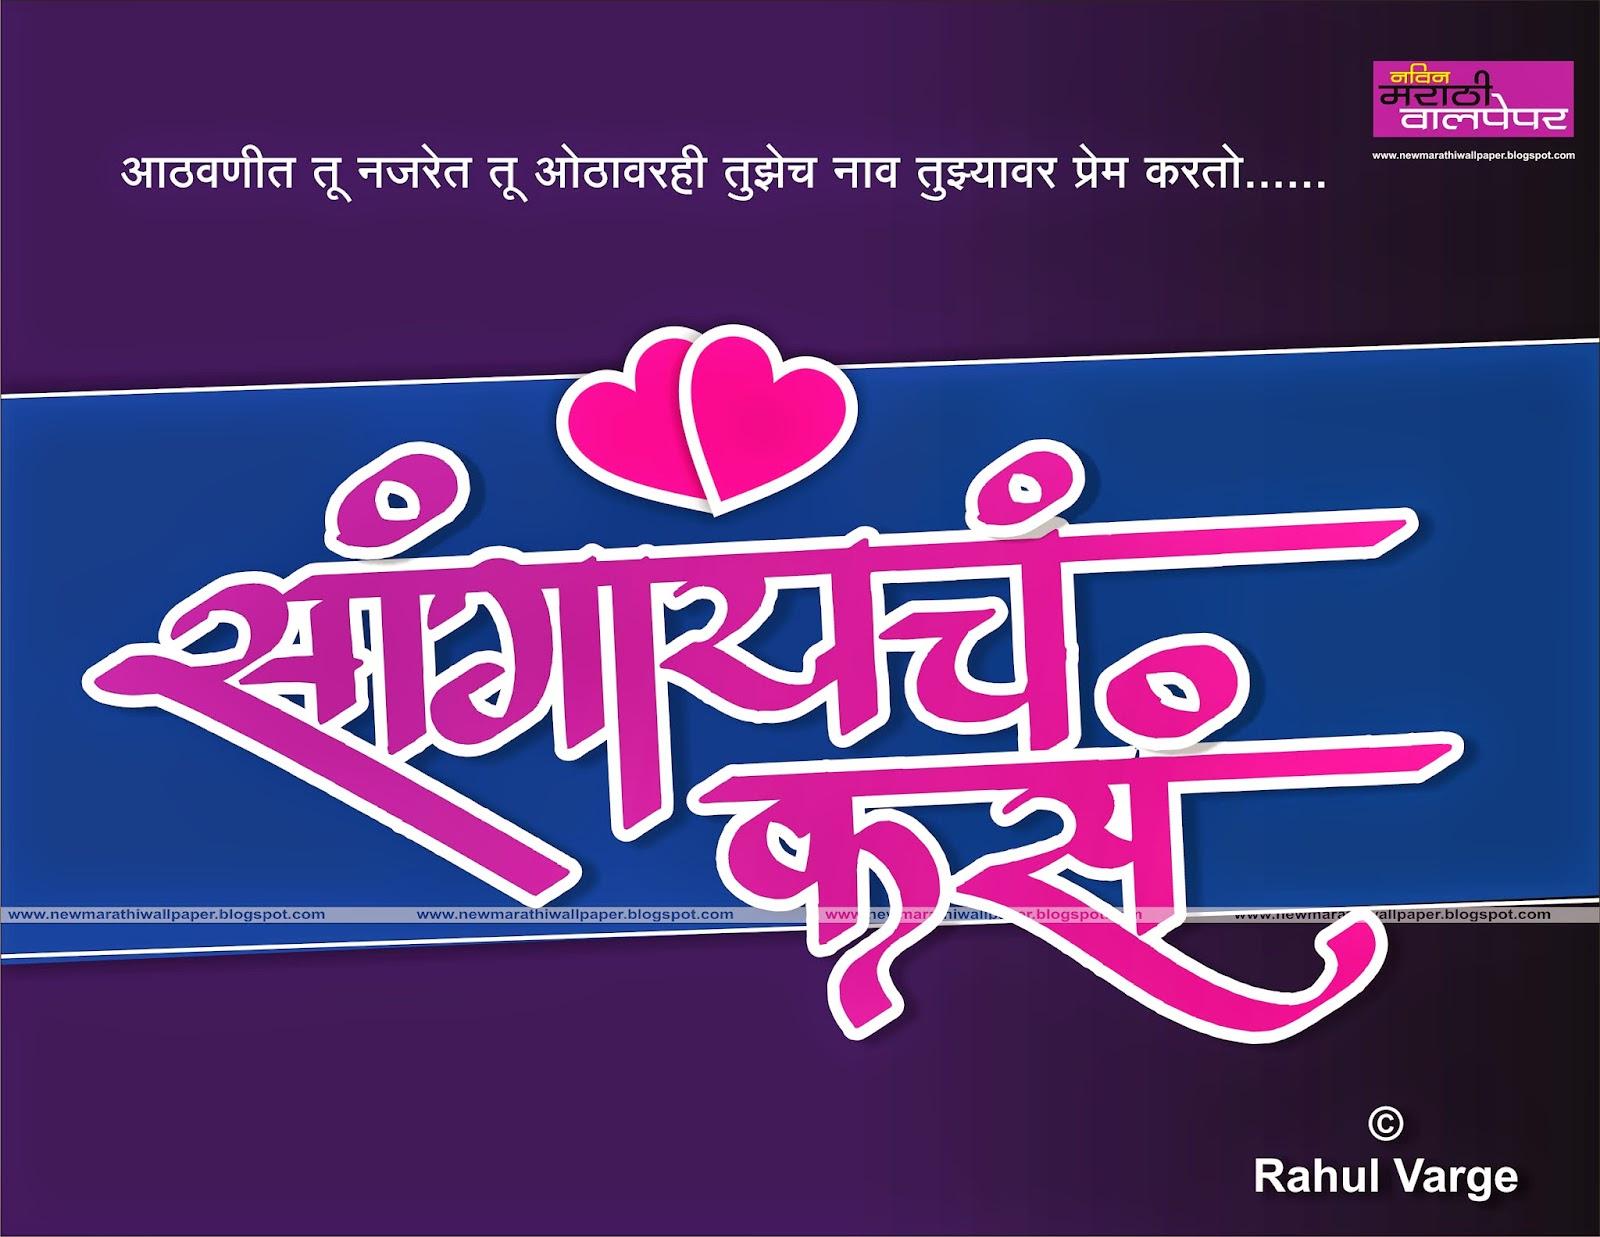 Sangaycha Kasa Love Marathi Wallpaper